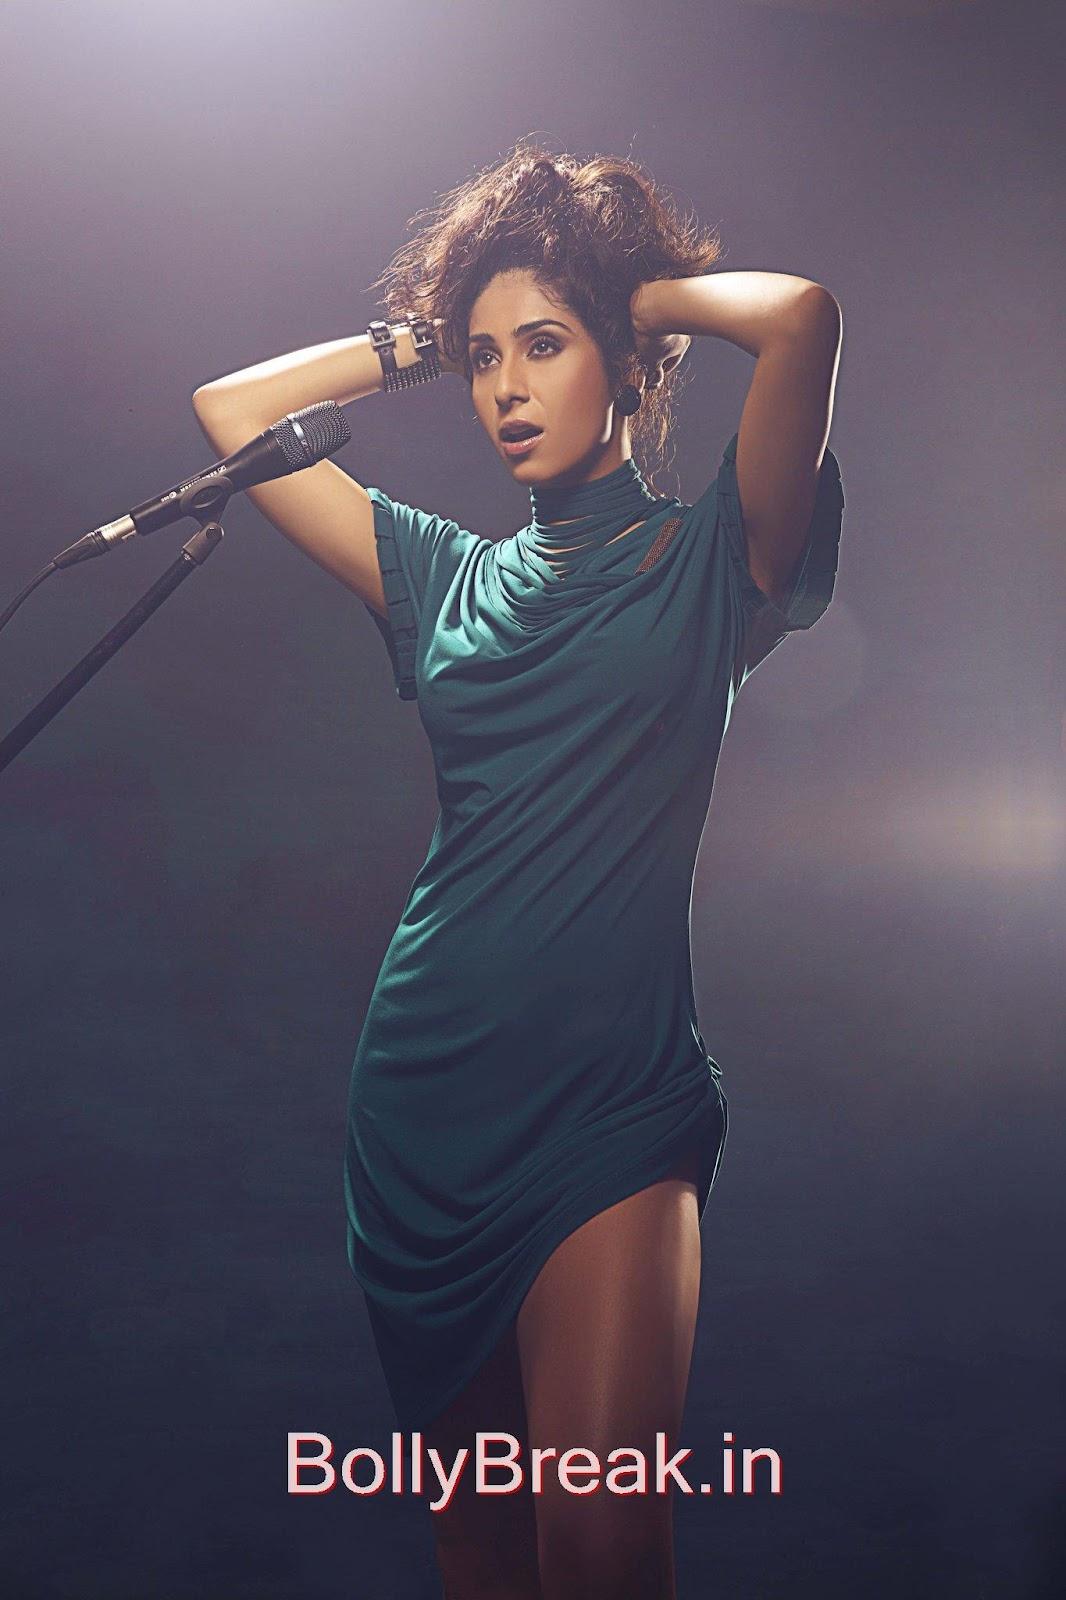 Hot Hd Pics Of Neha Bhasin Photoshoot Stills - 9 Pics-9795